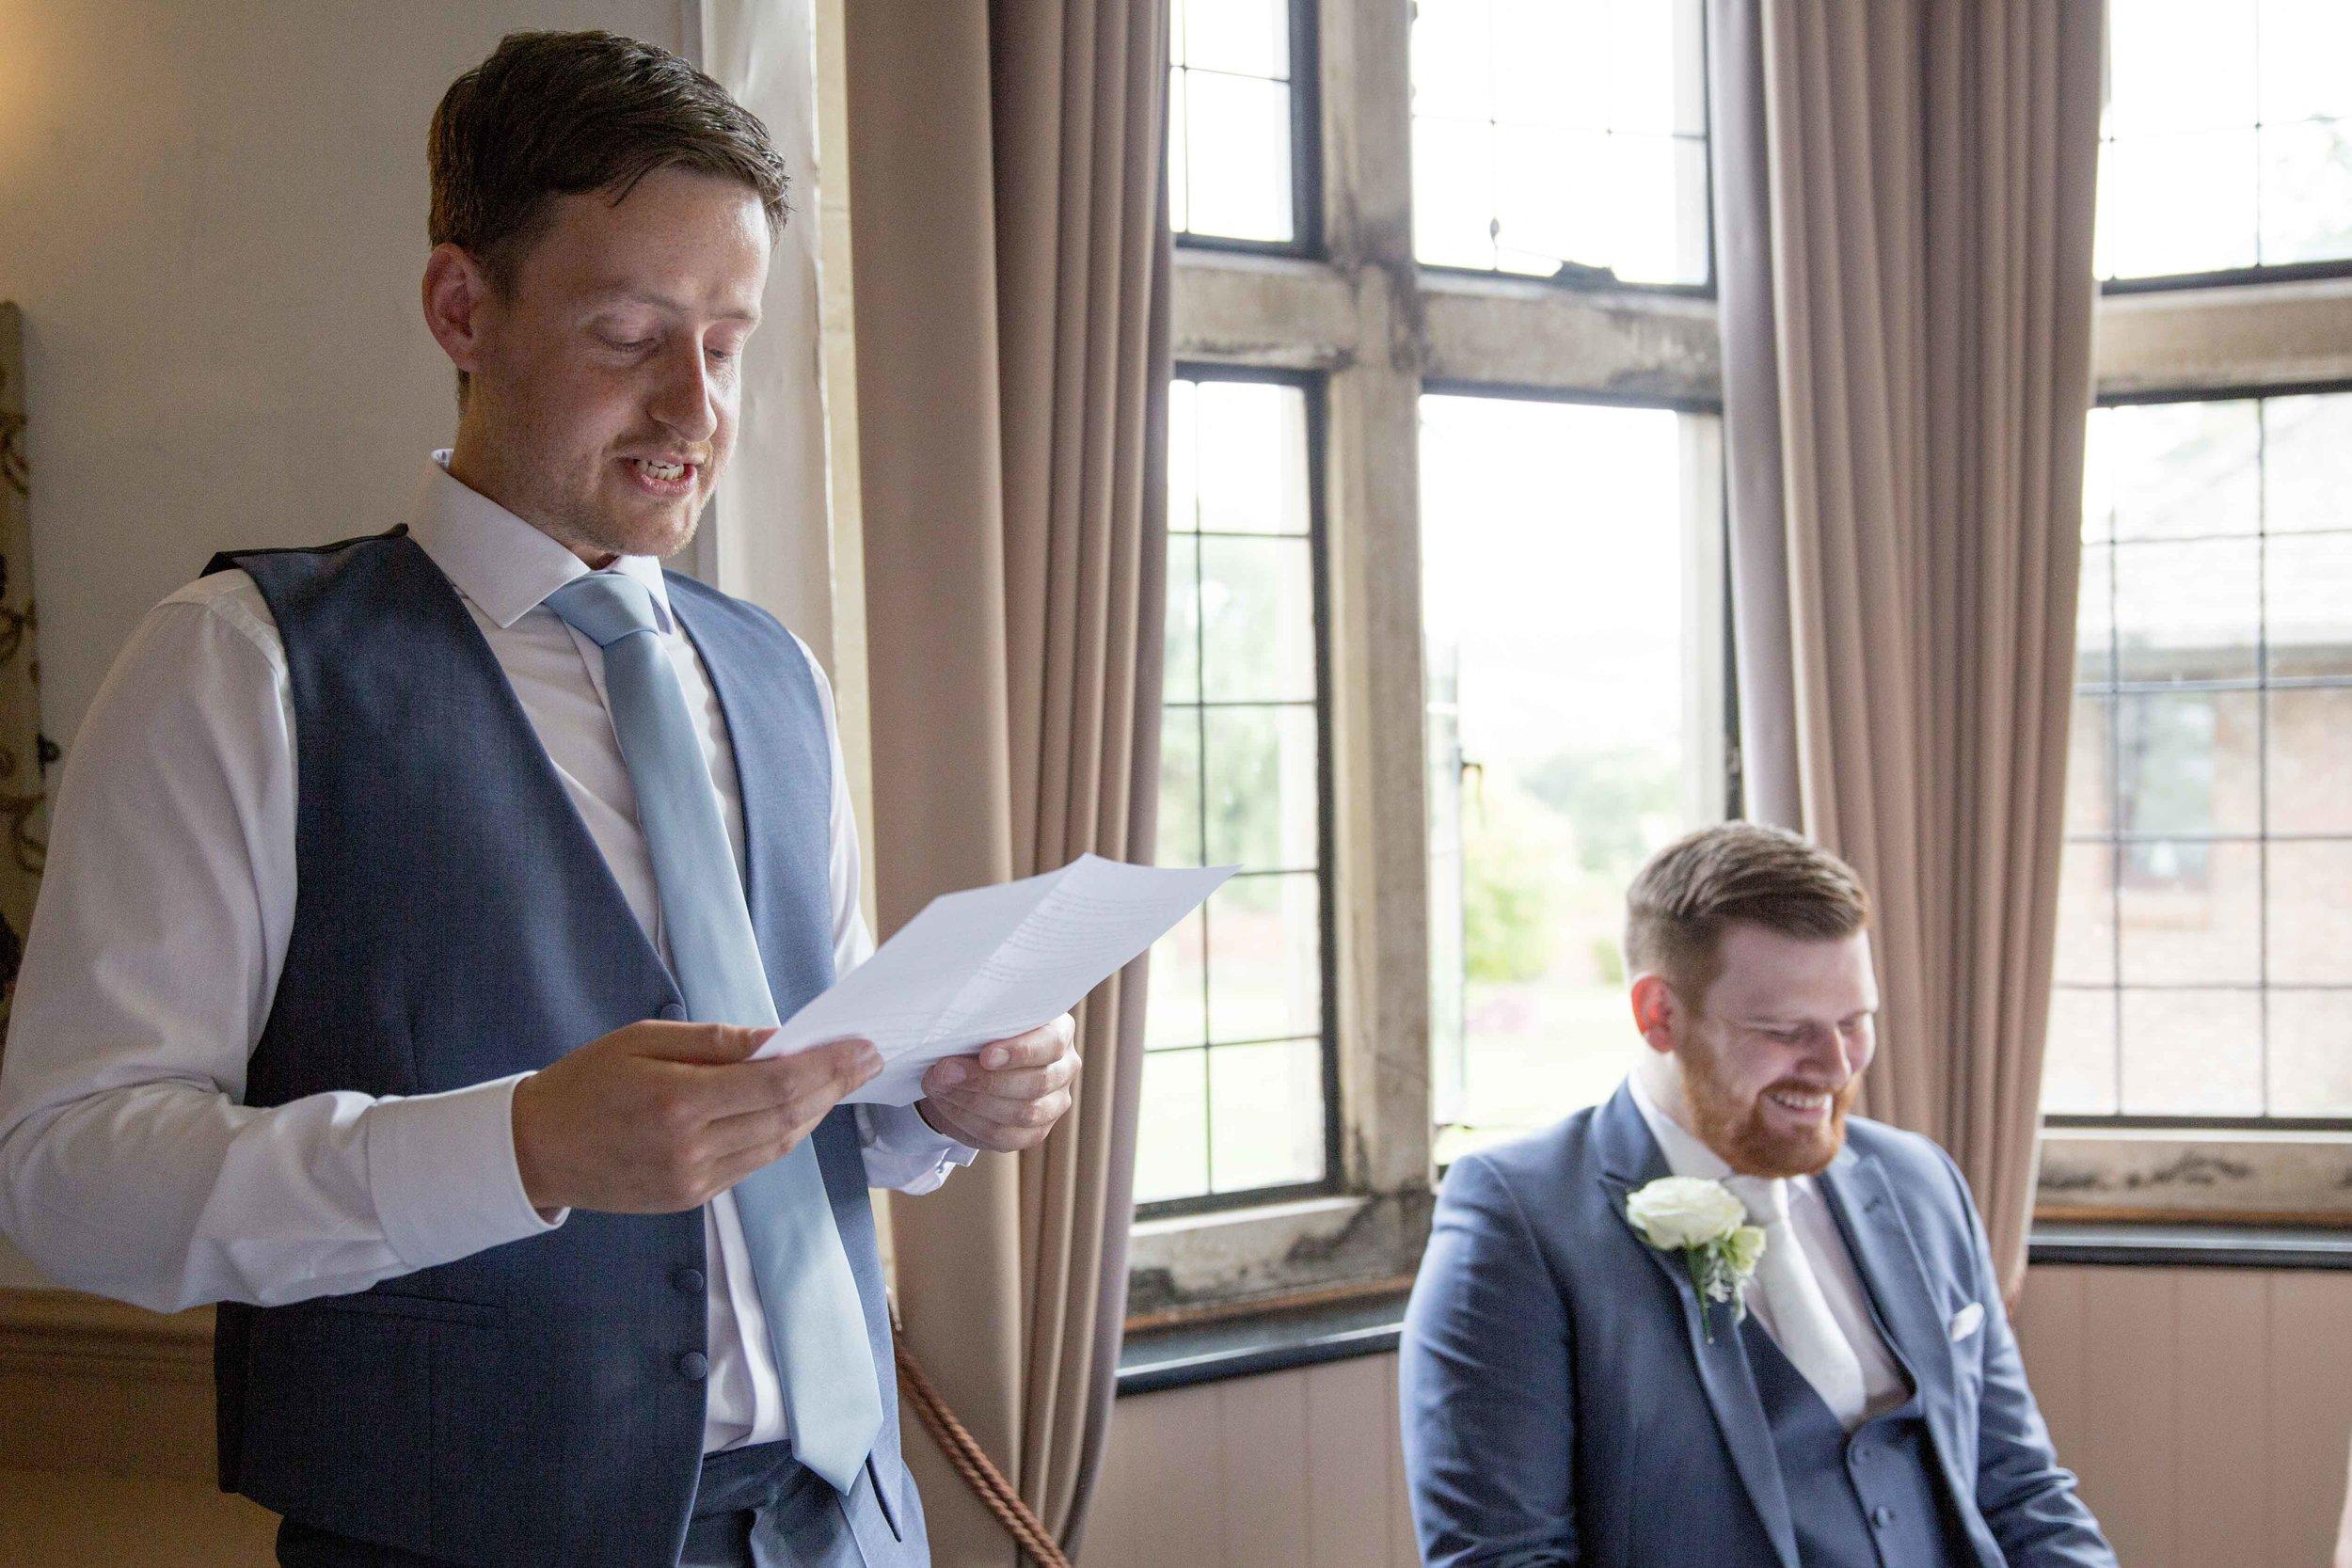 cotswold-wedding-photography-at-stonehouse-court-hotel-natalia-smith-photography-gloucestershire-wedding-photographer-84.jpg